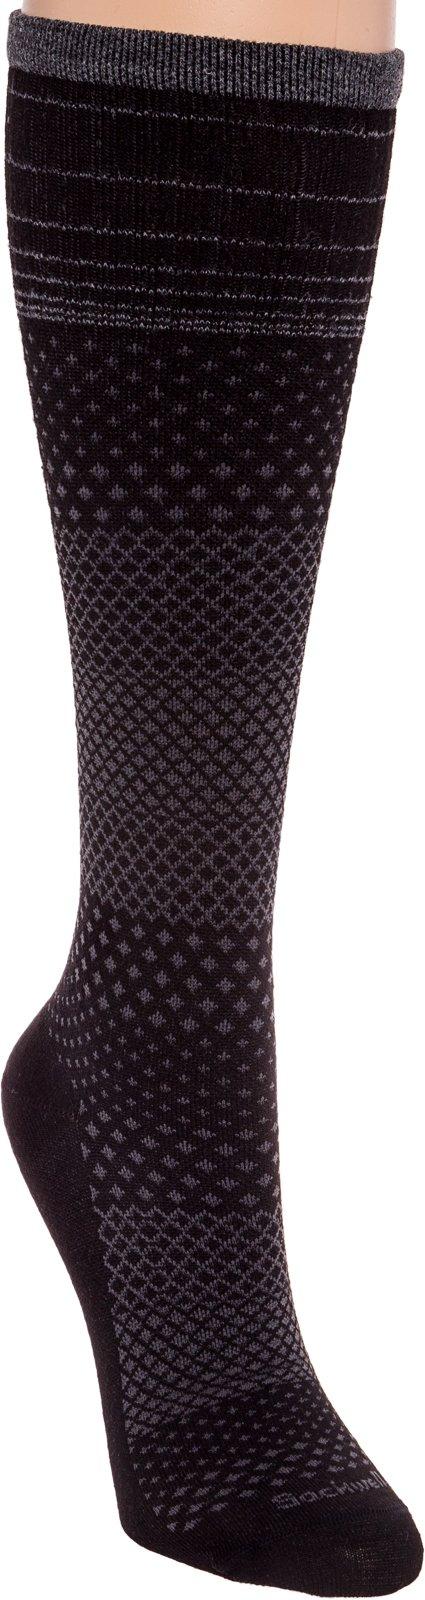 Sockwell Women's Micro Grade Graduated Compression Socks, Black, Small/Medium